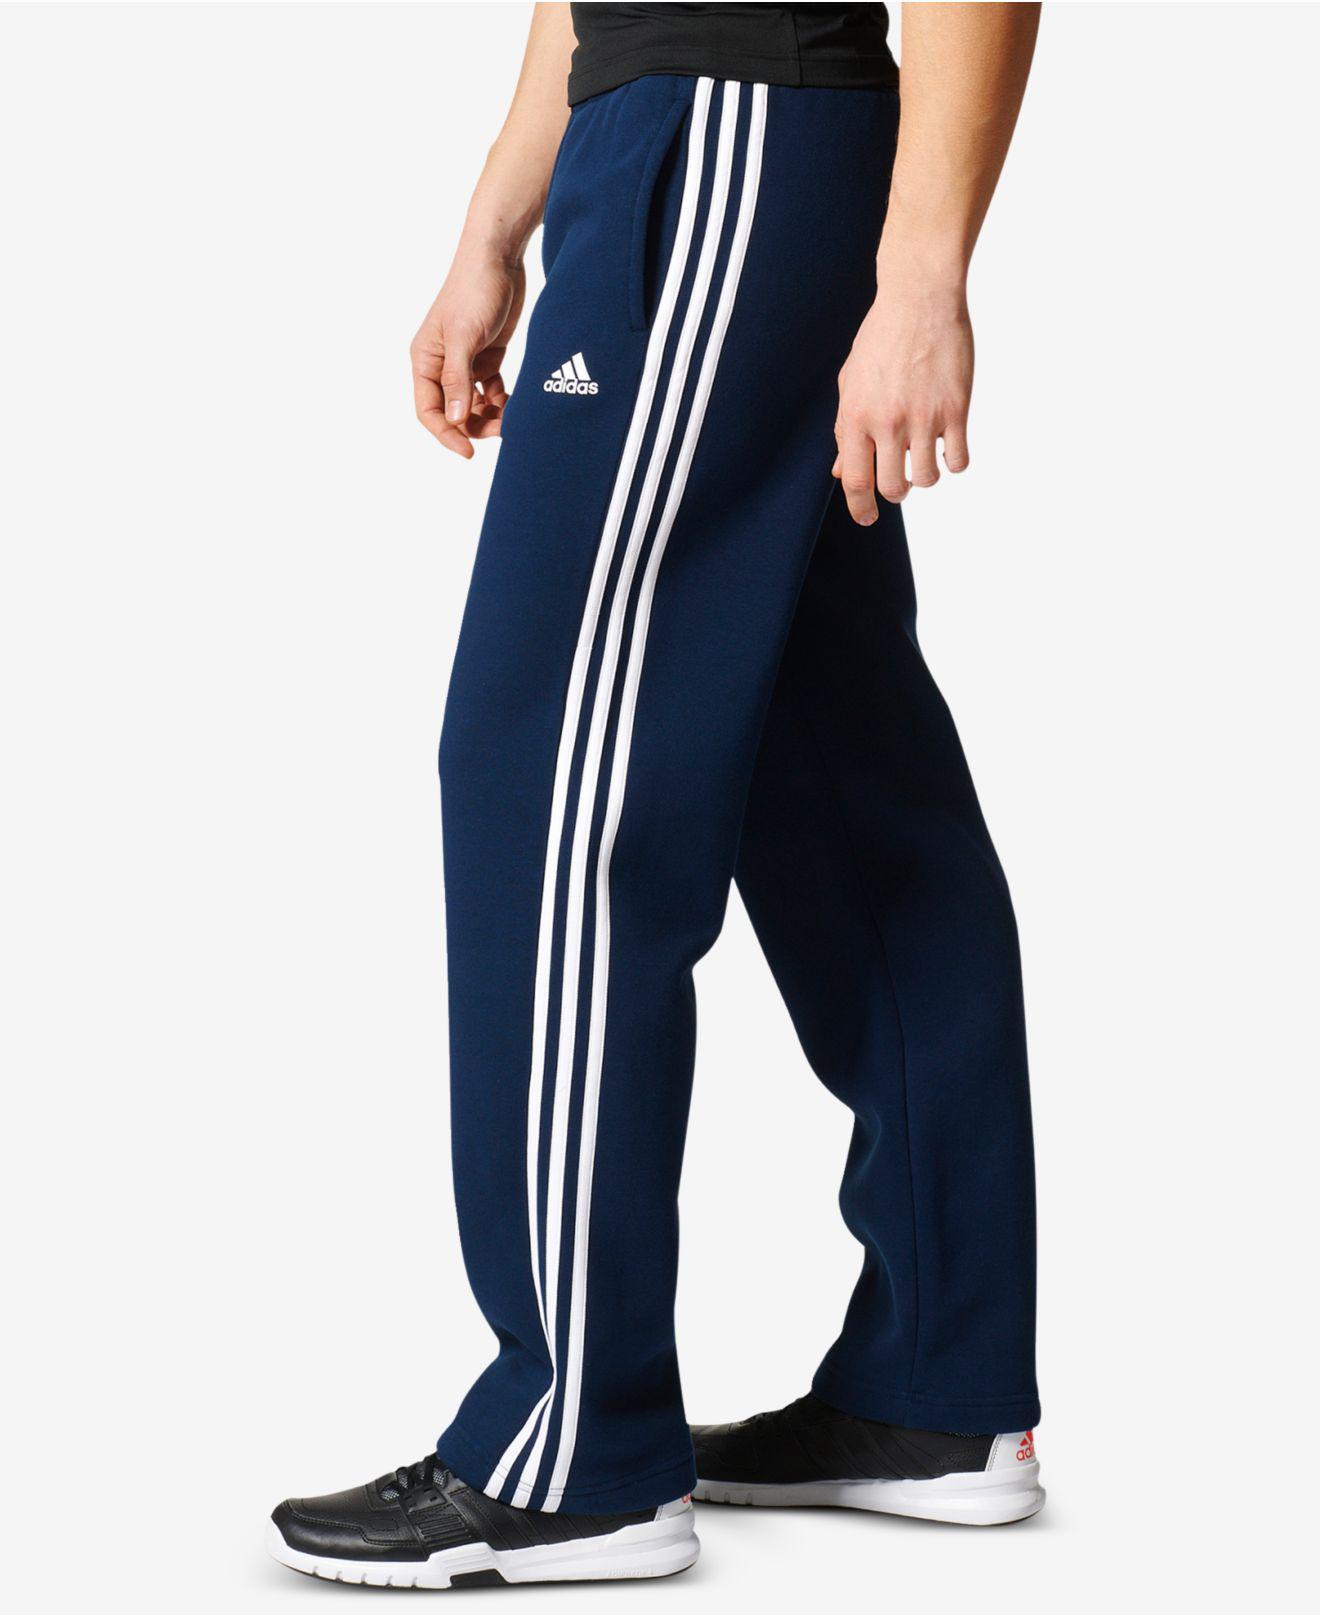 95f286b5d65b Lyst - adidas Men s Essentials Fleece Sweatpants in Blue for Men